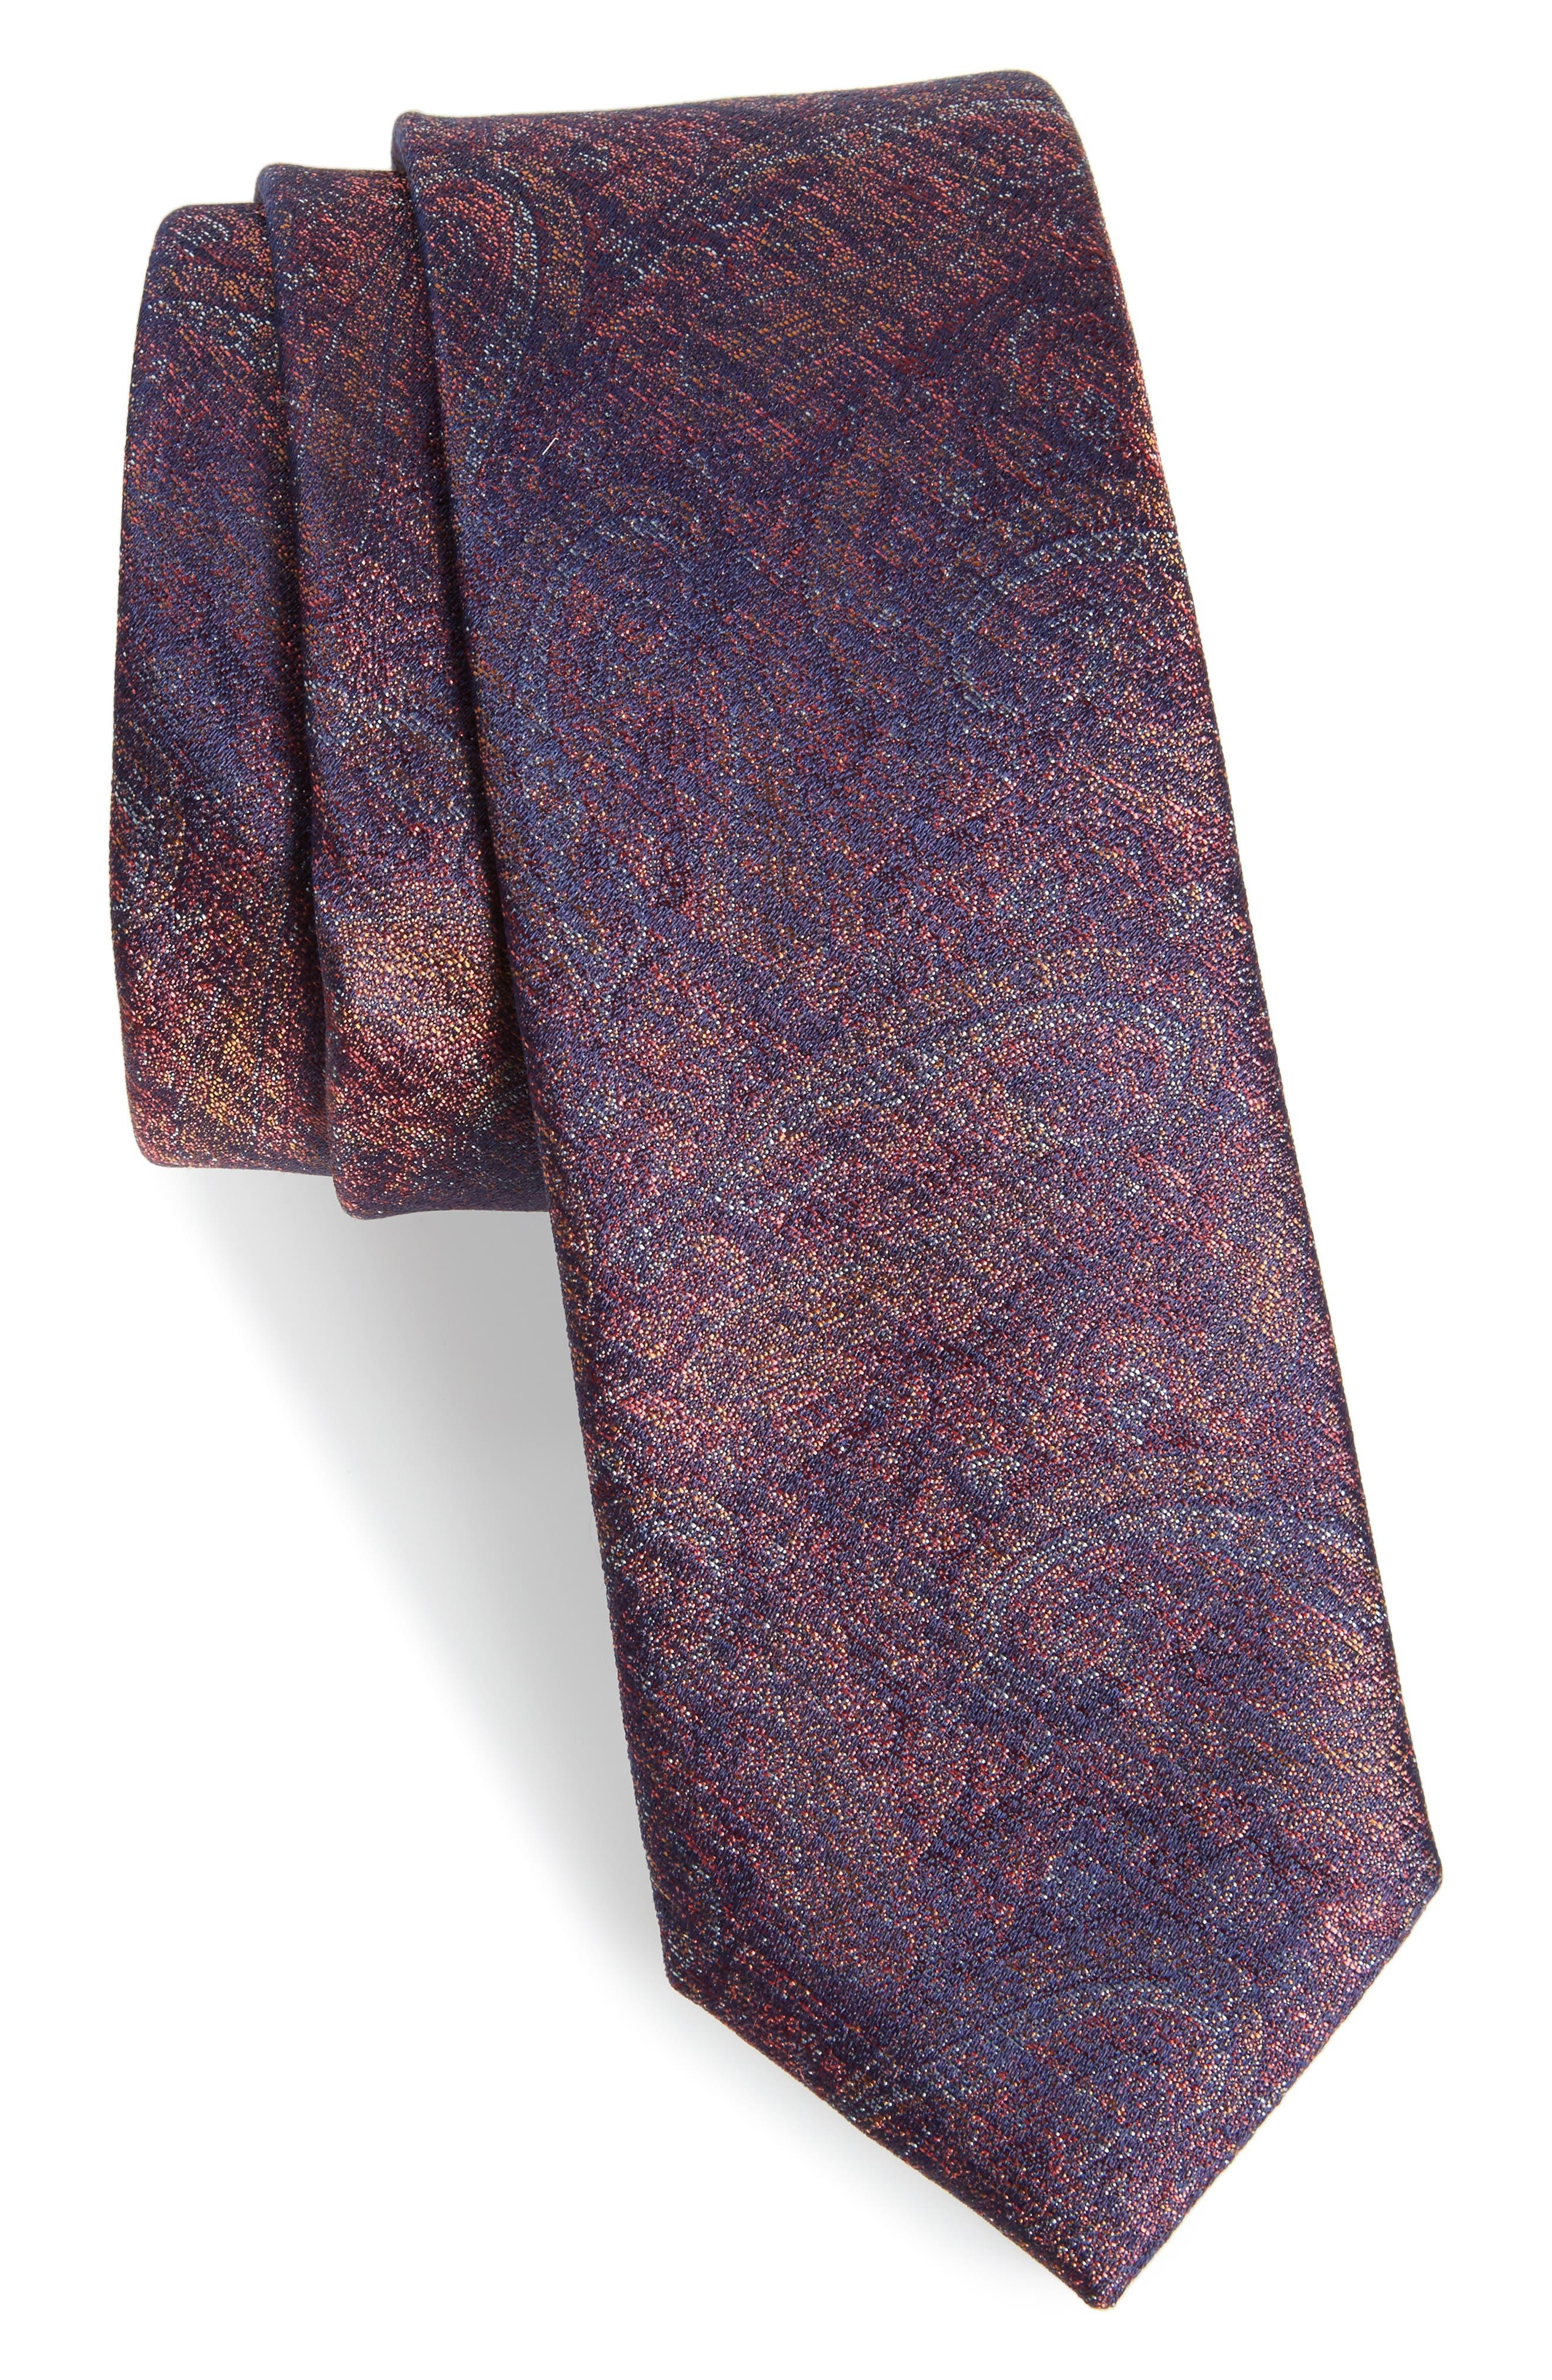 Alexander Paisley Silk Tie,                             Main thumbnail 1, color,                             220